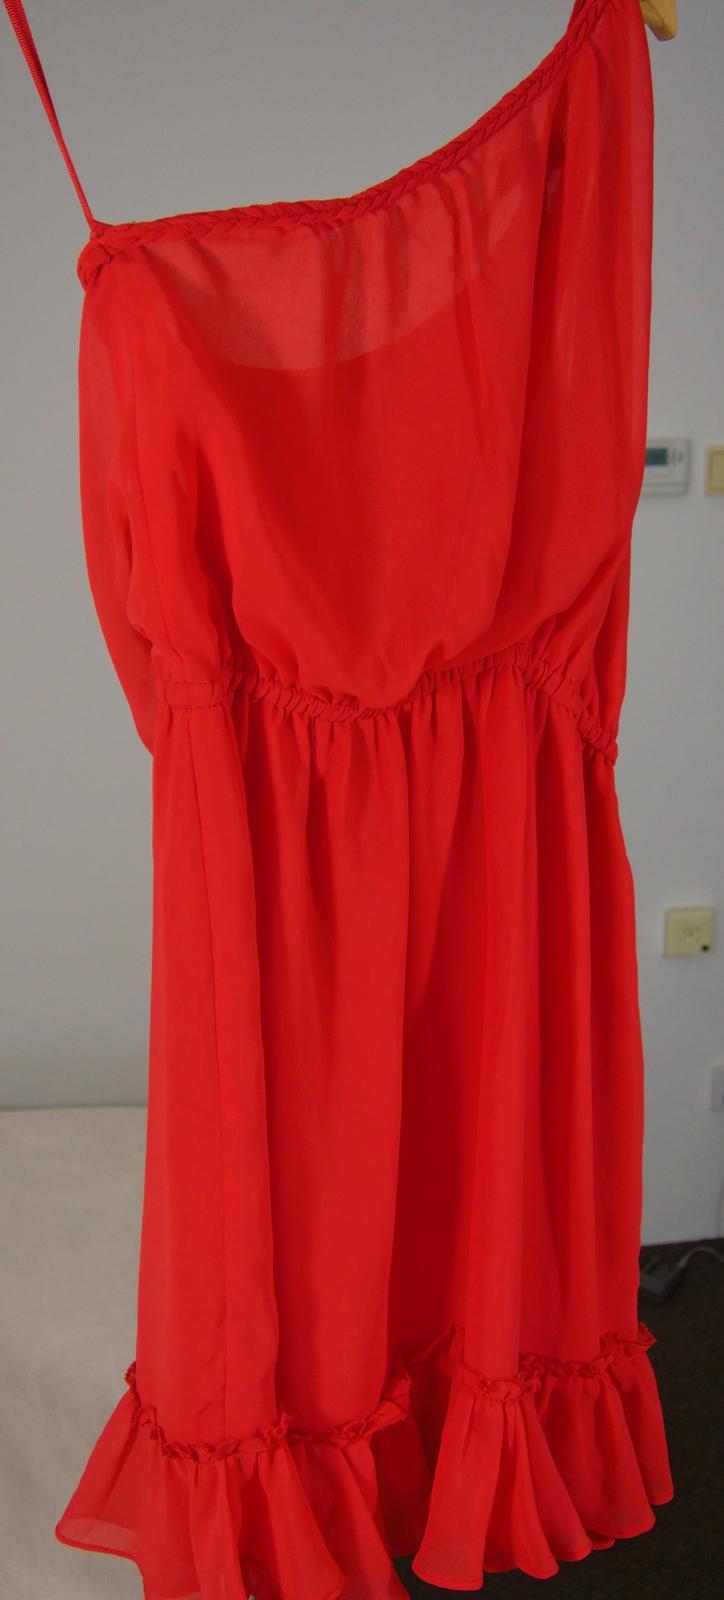 8456240120ee Červené šaty mango - veľ. s